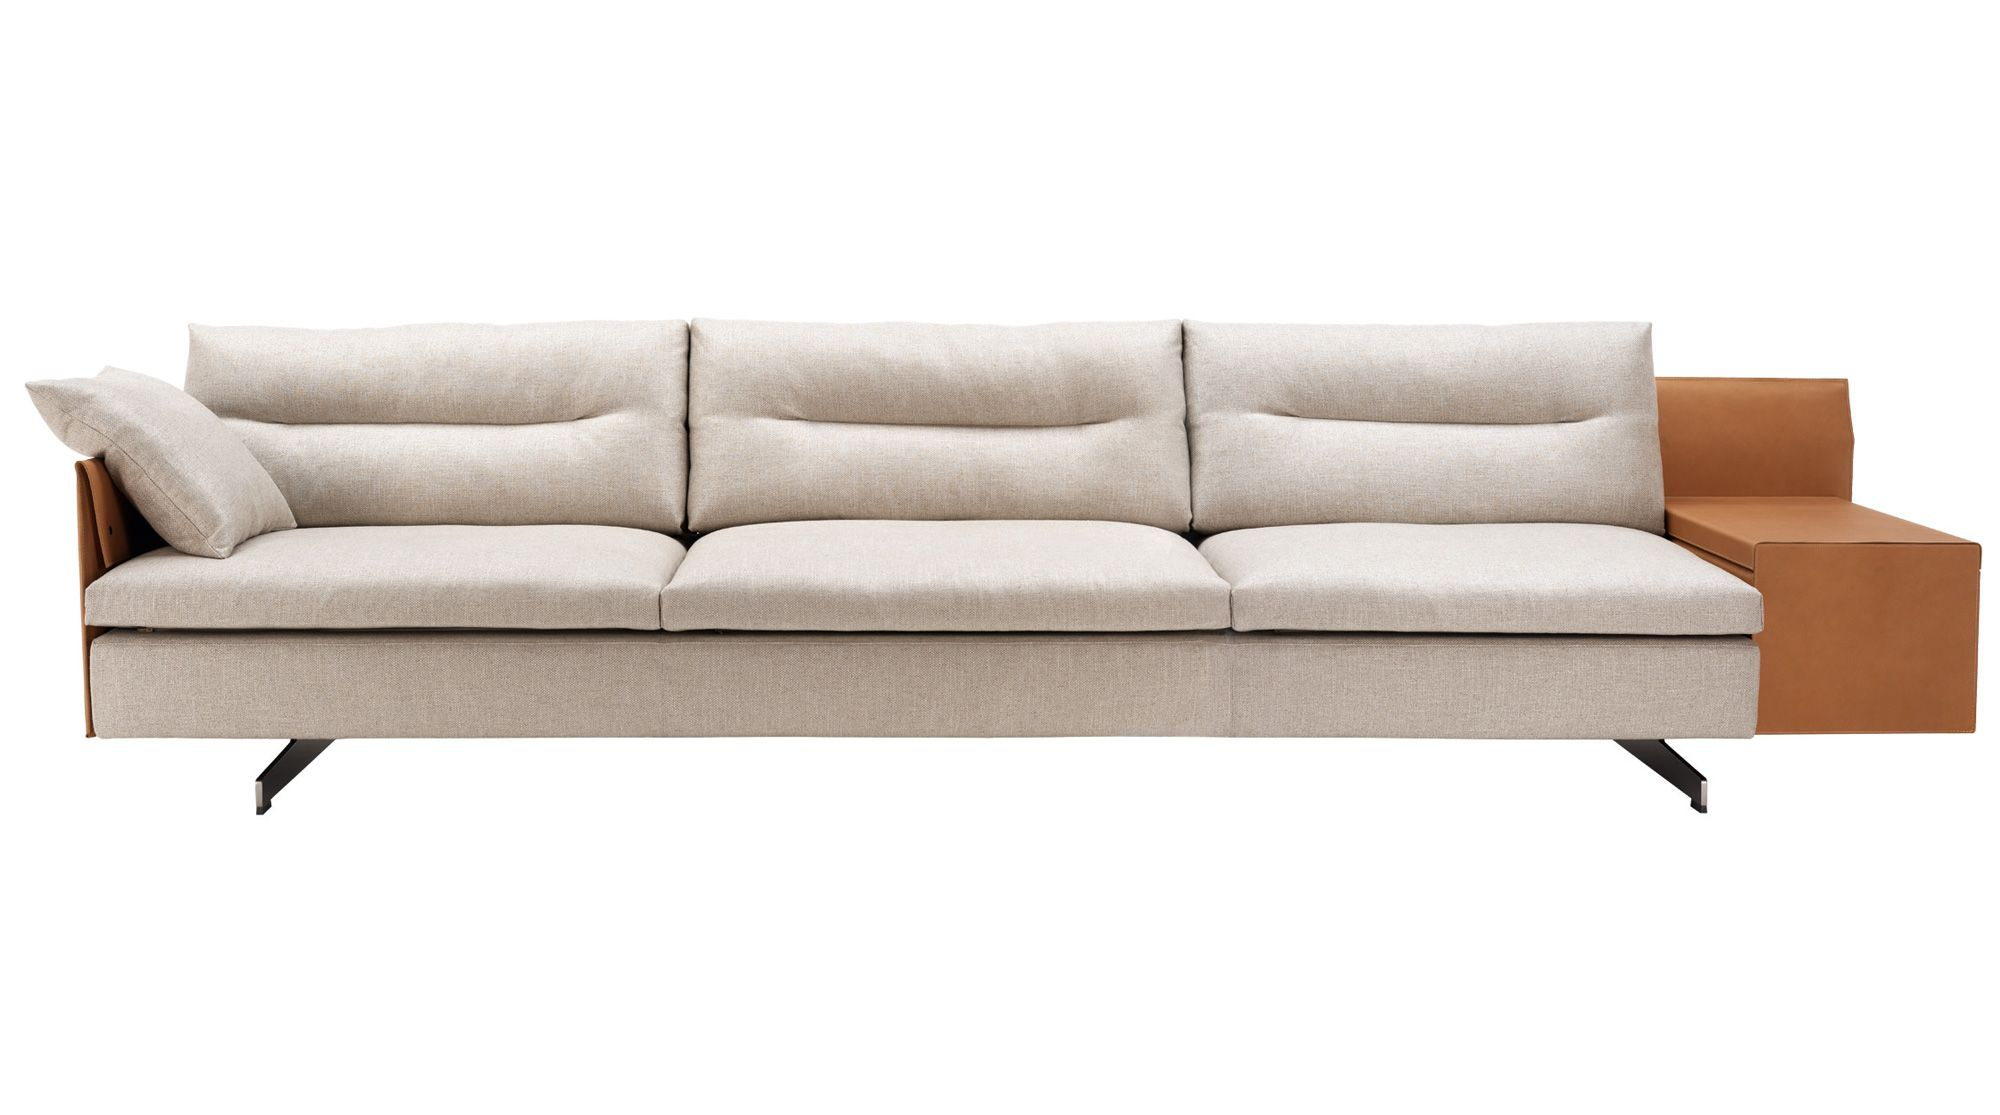 Poltrona Frau Grantorino Google Search Settee Sofa